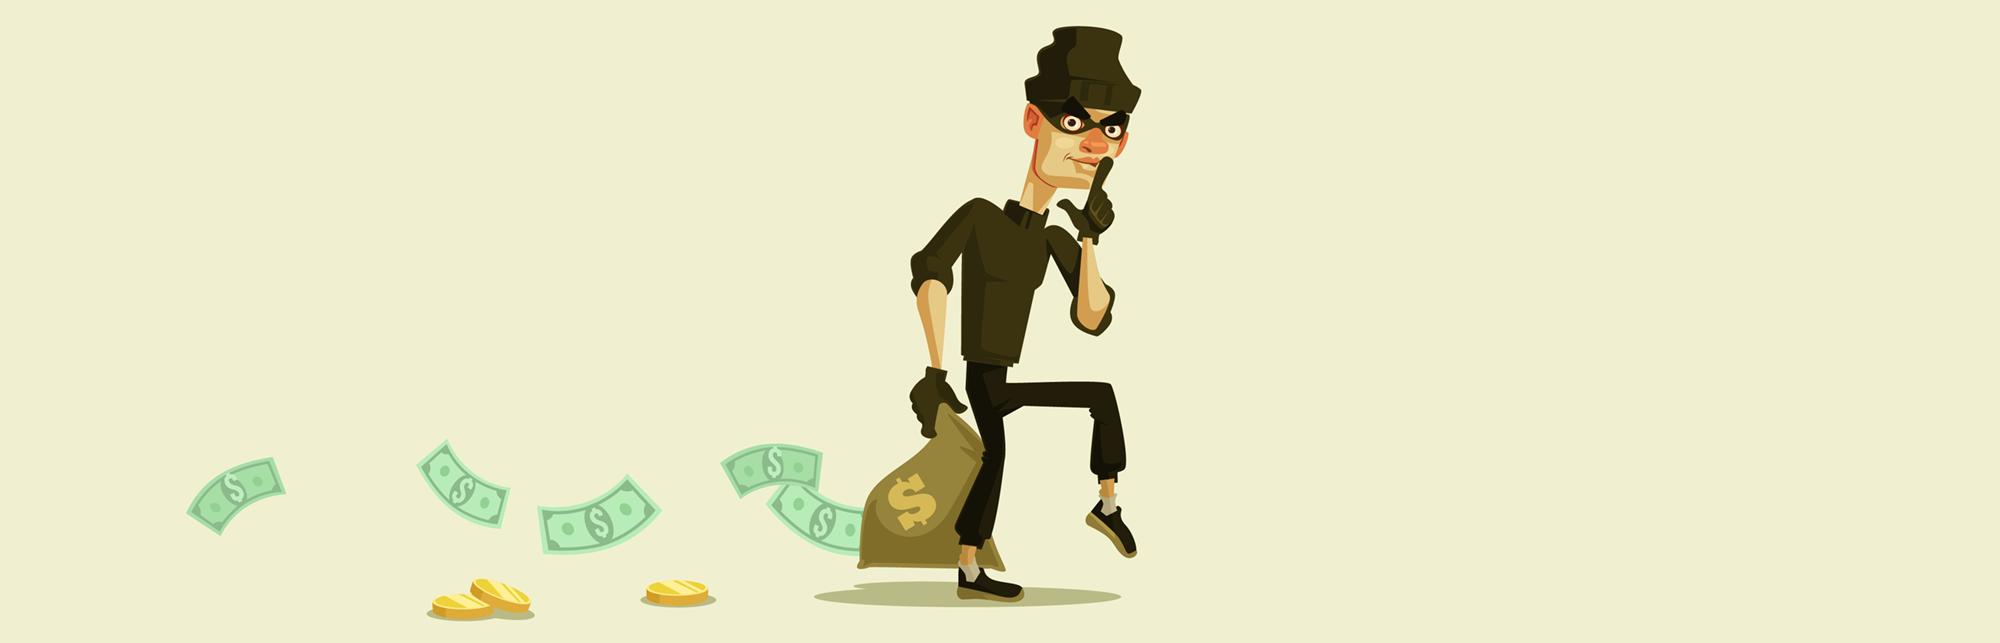 cyberattack_157141837-blog